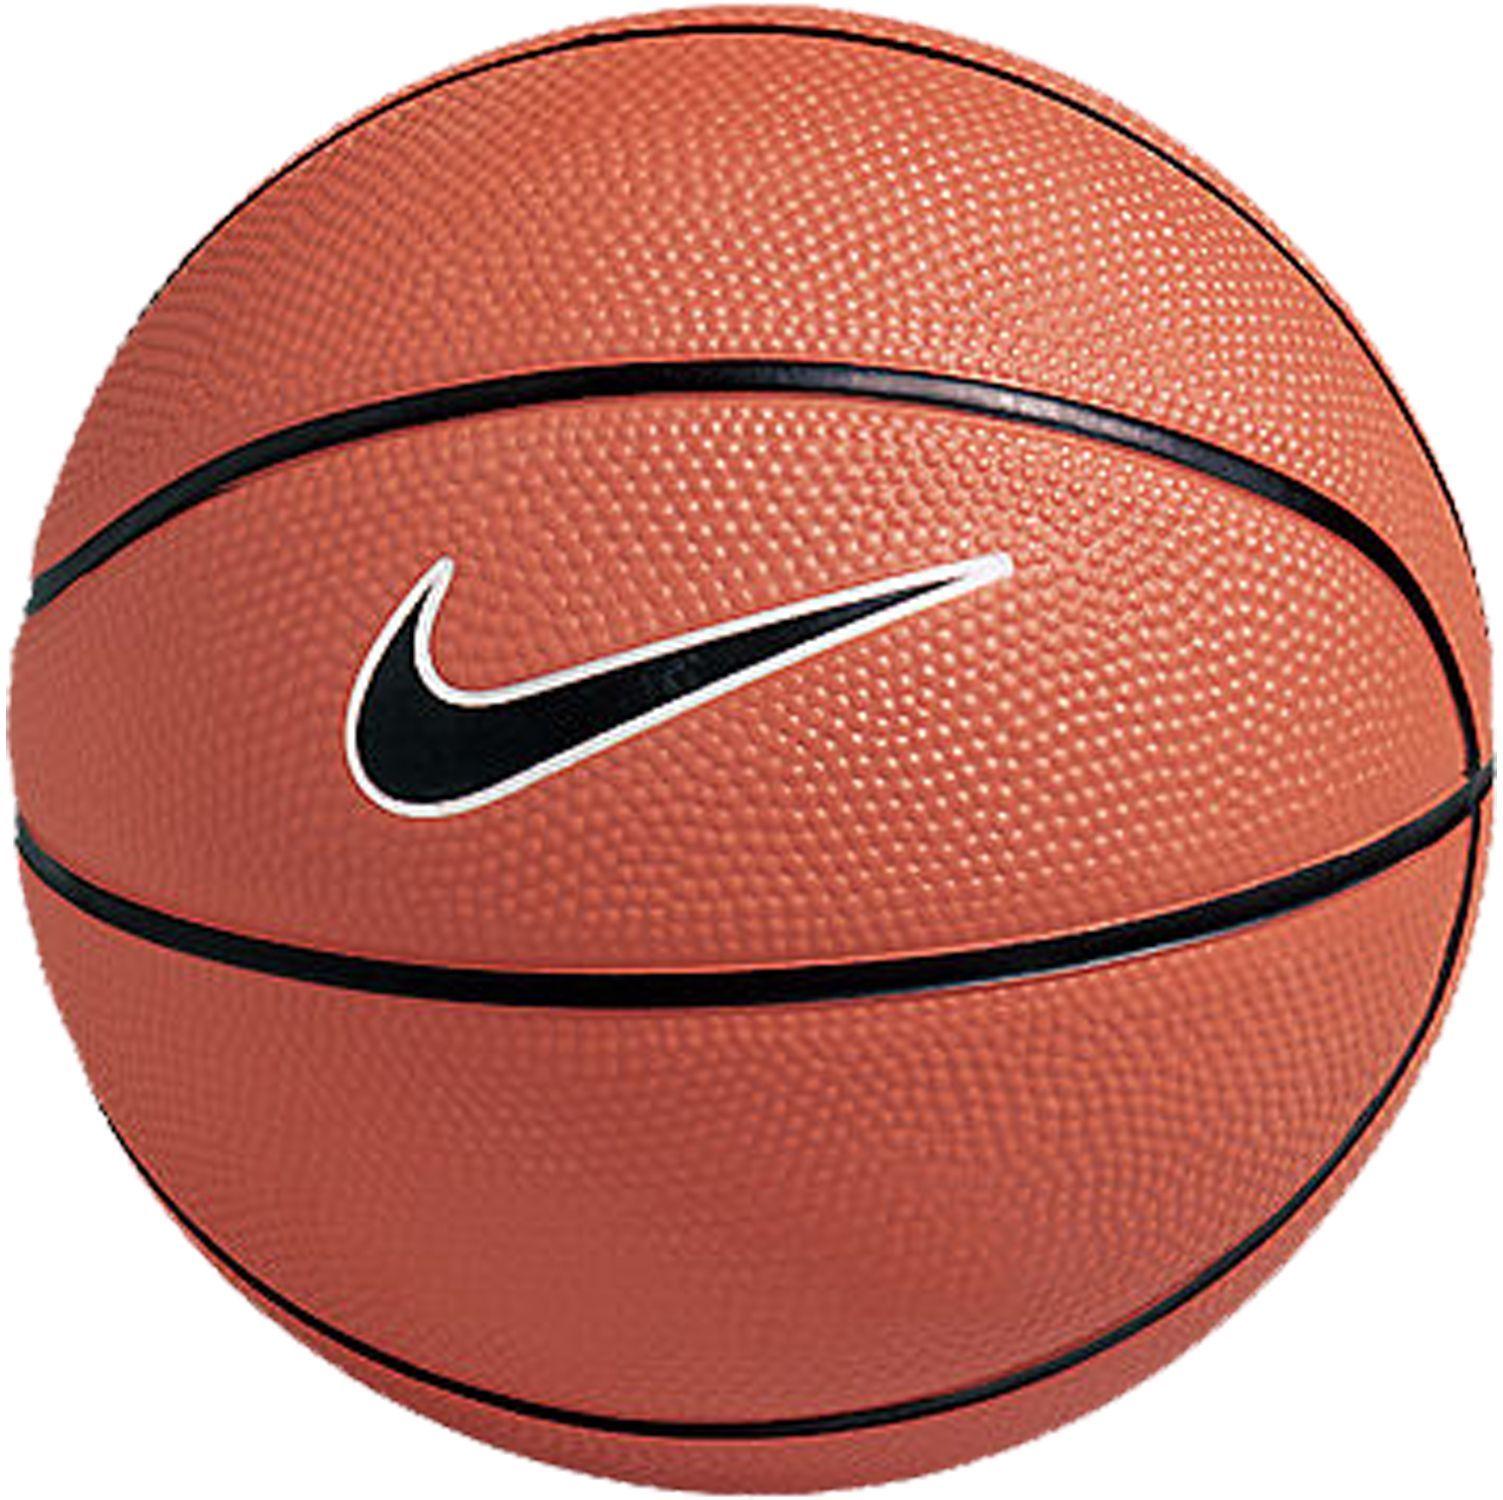 Nike Swoosh Mini Basketball, Amber Basketball